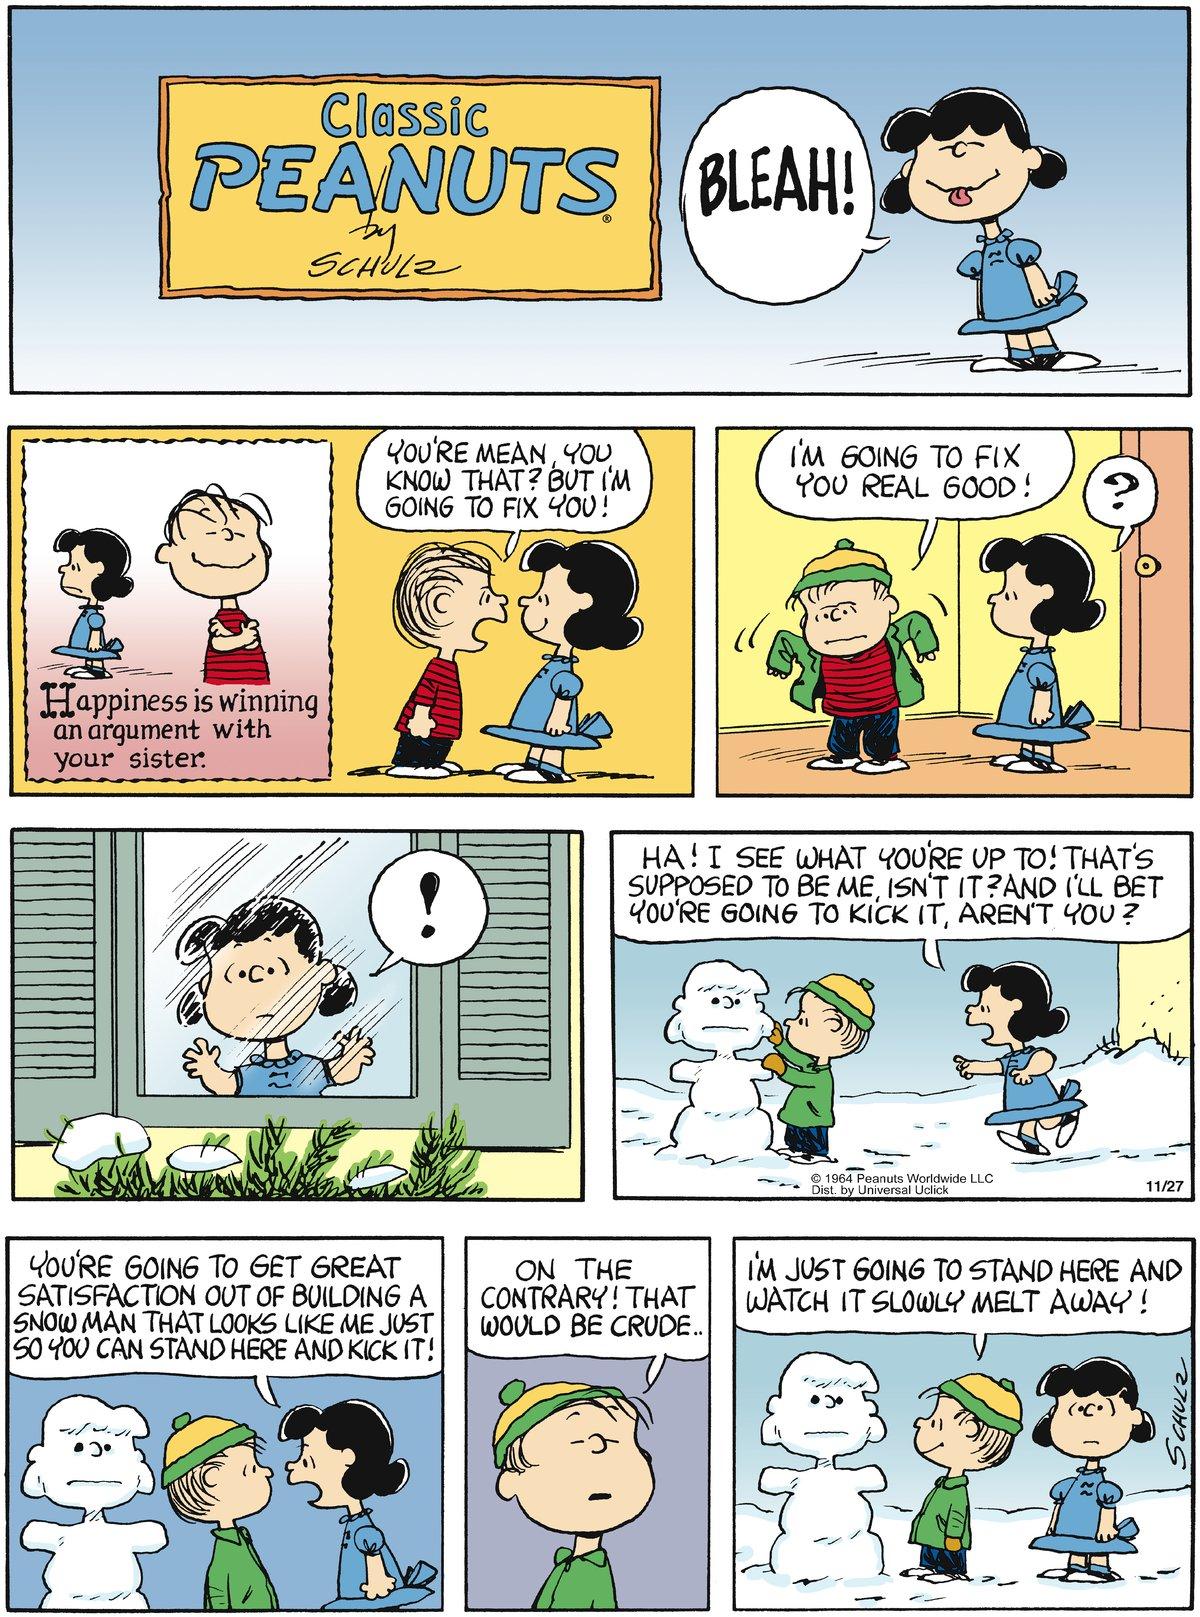 Peanuts for Nov 27, 2011 Comic Strip